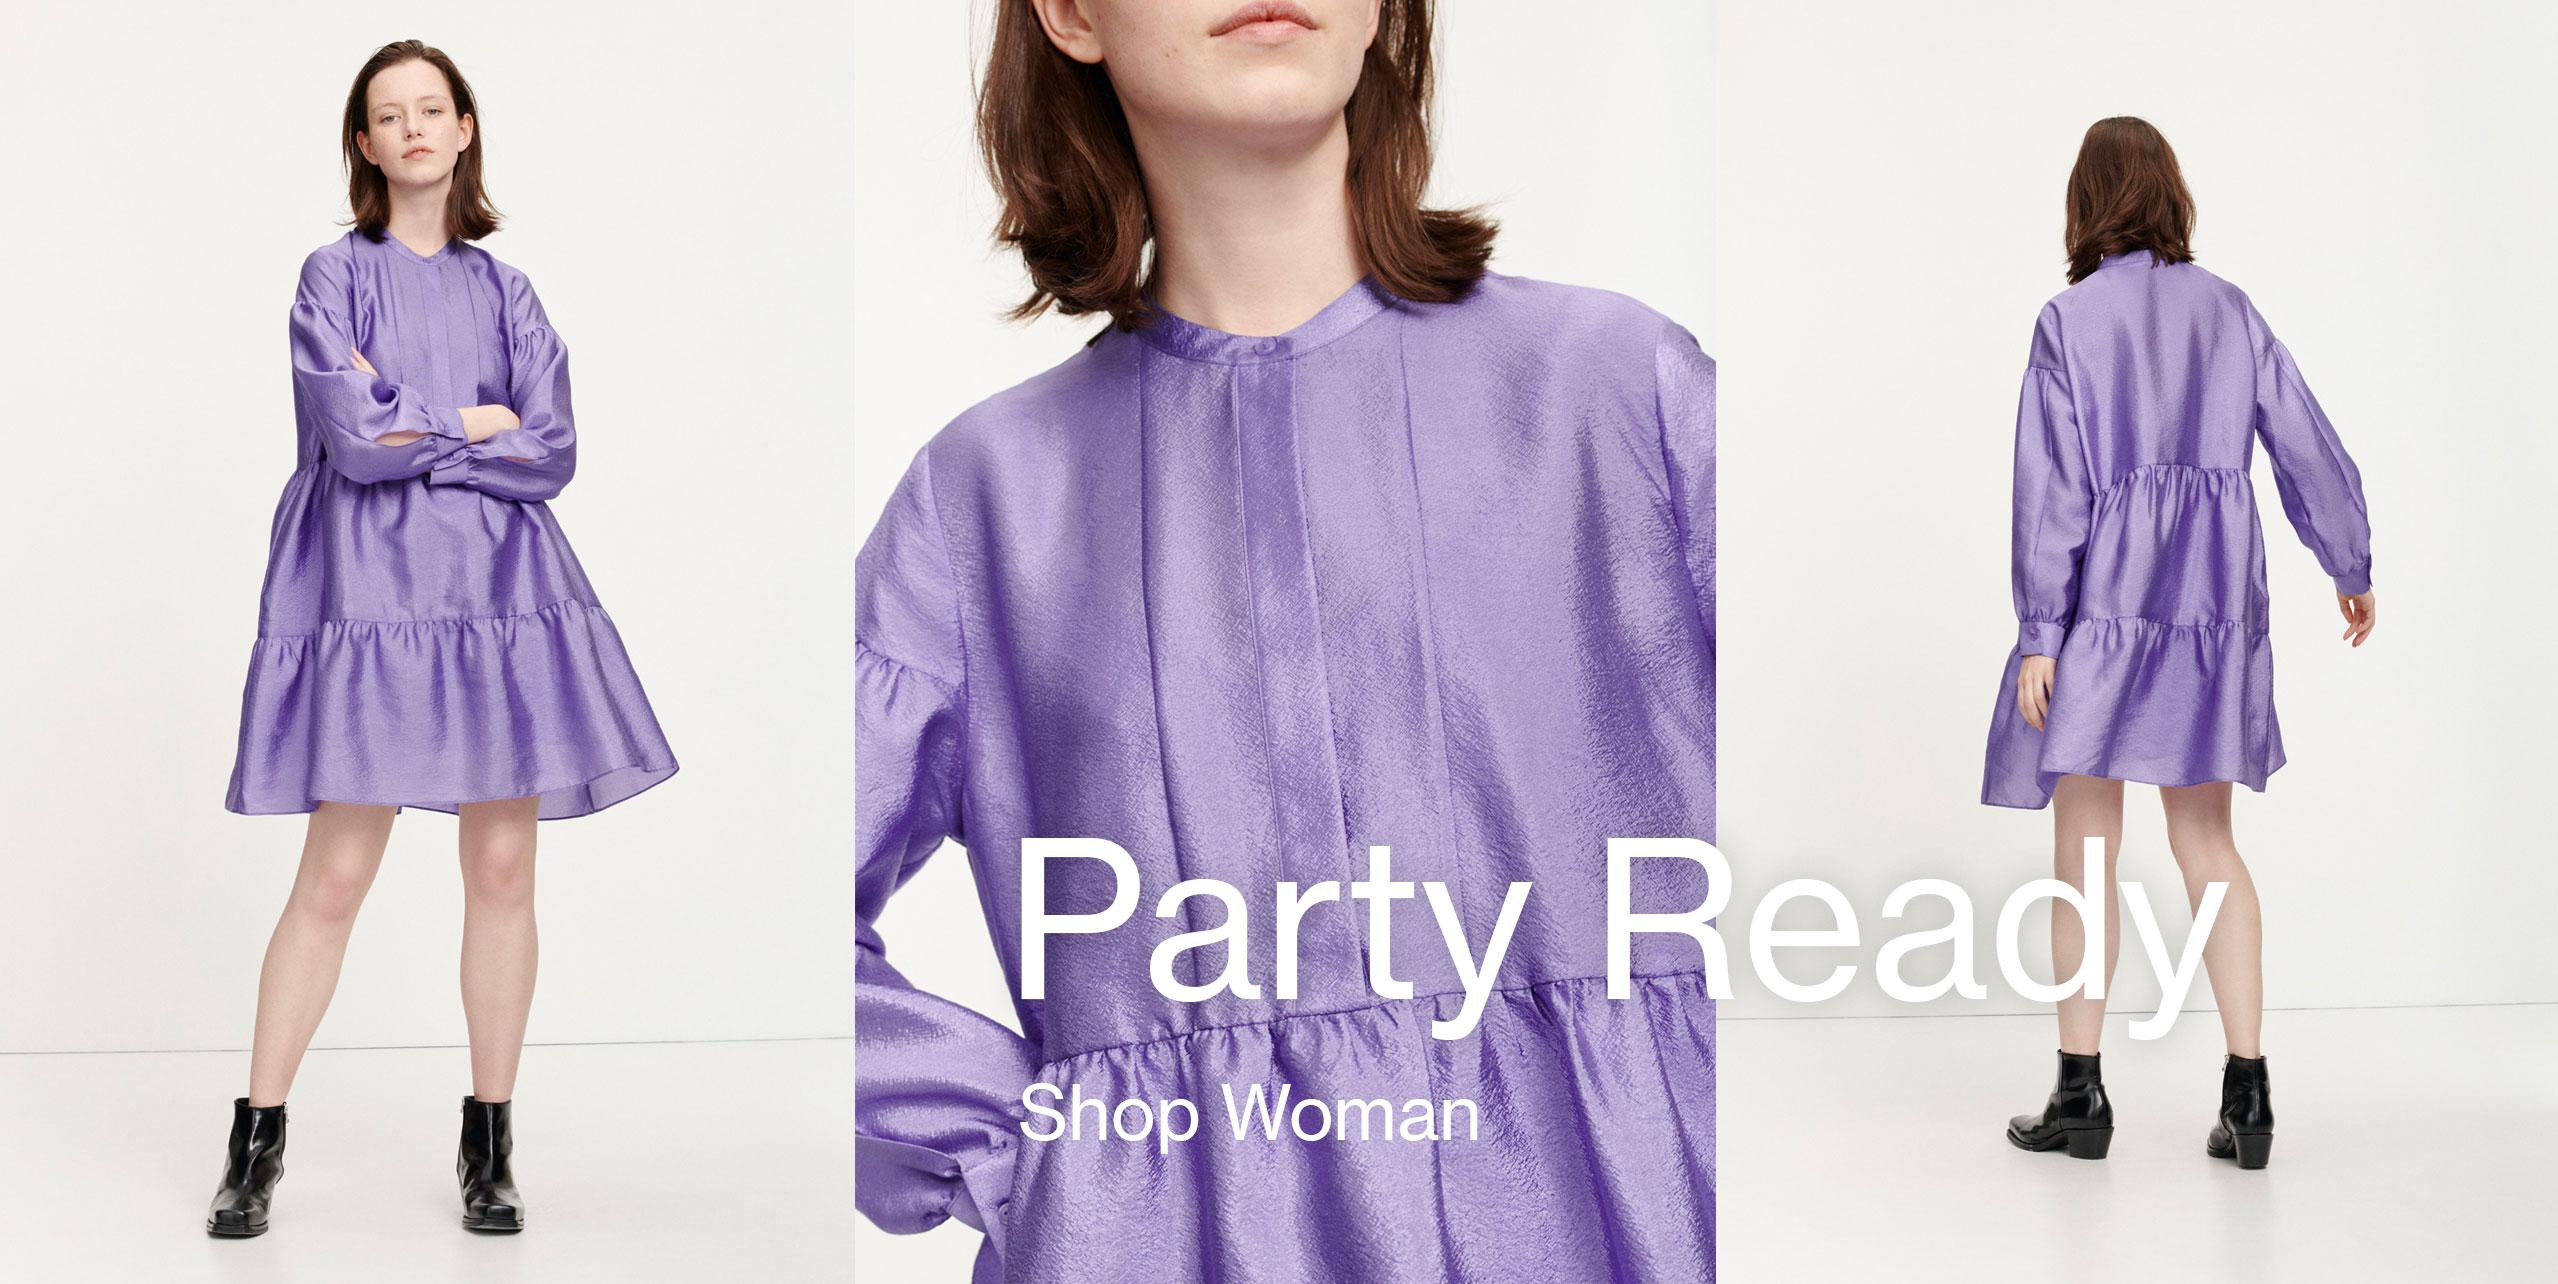 Party ready Women's fashion